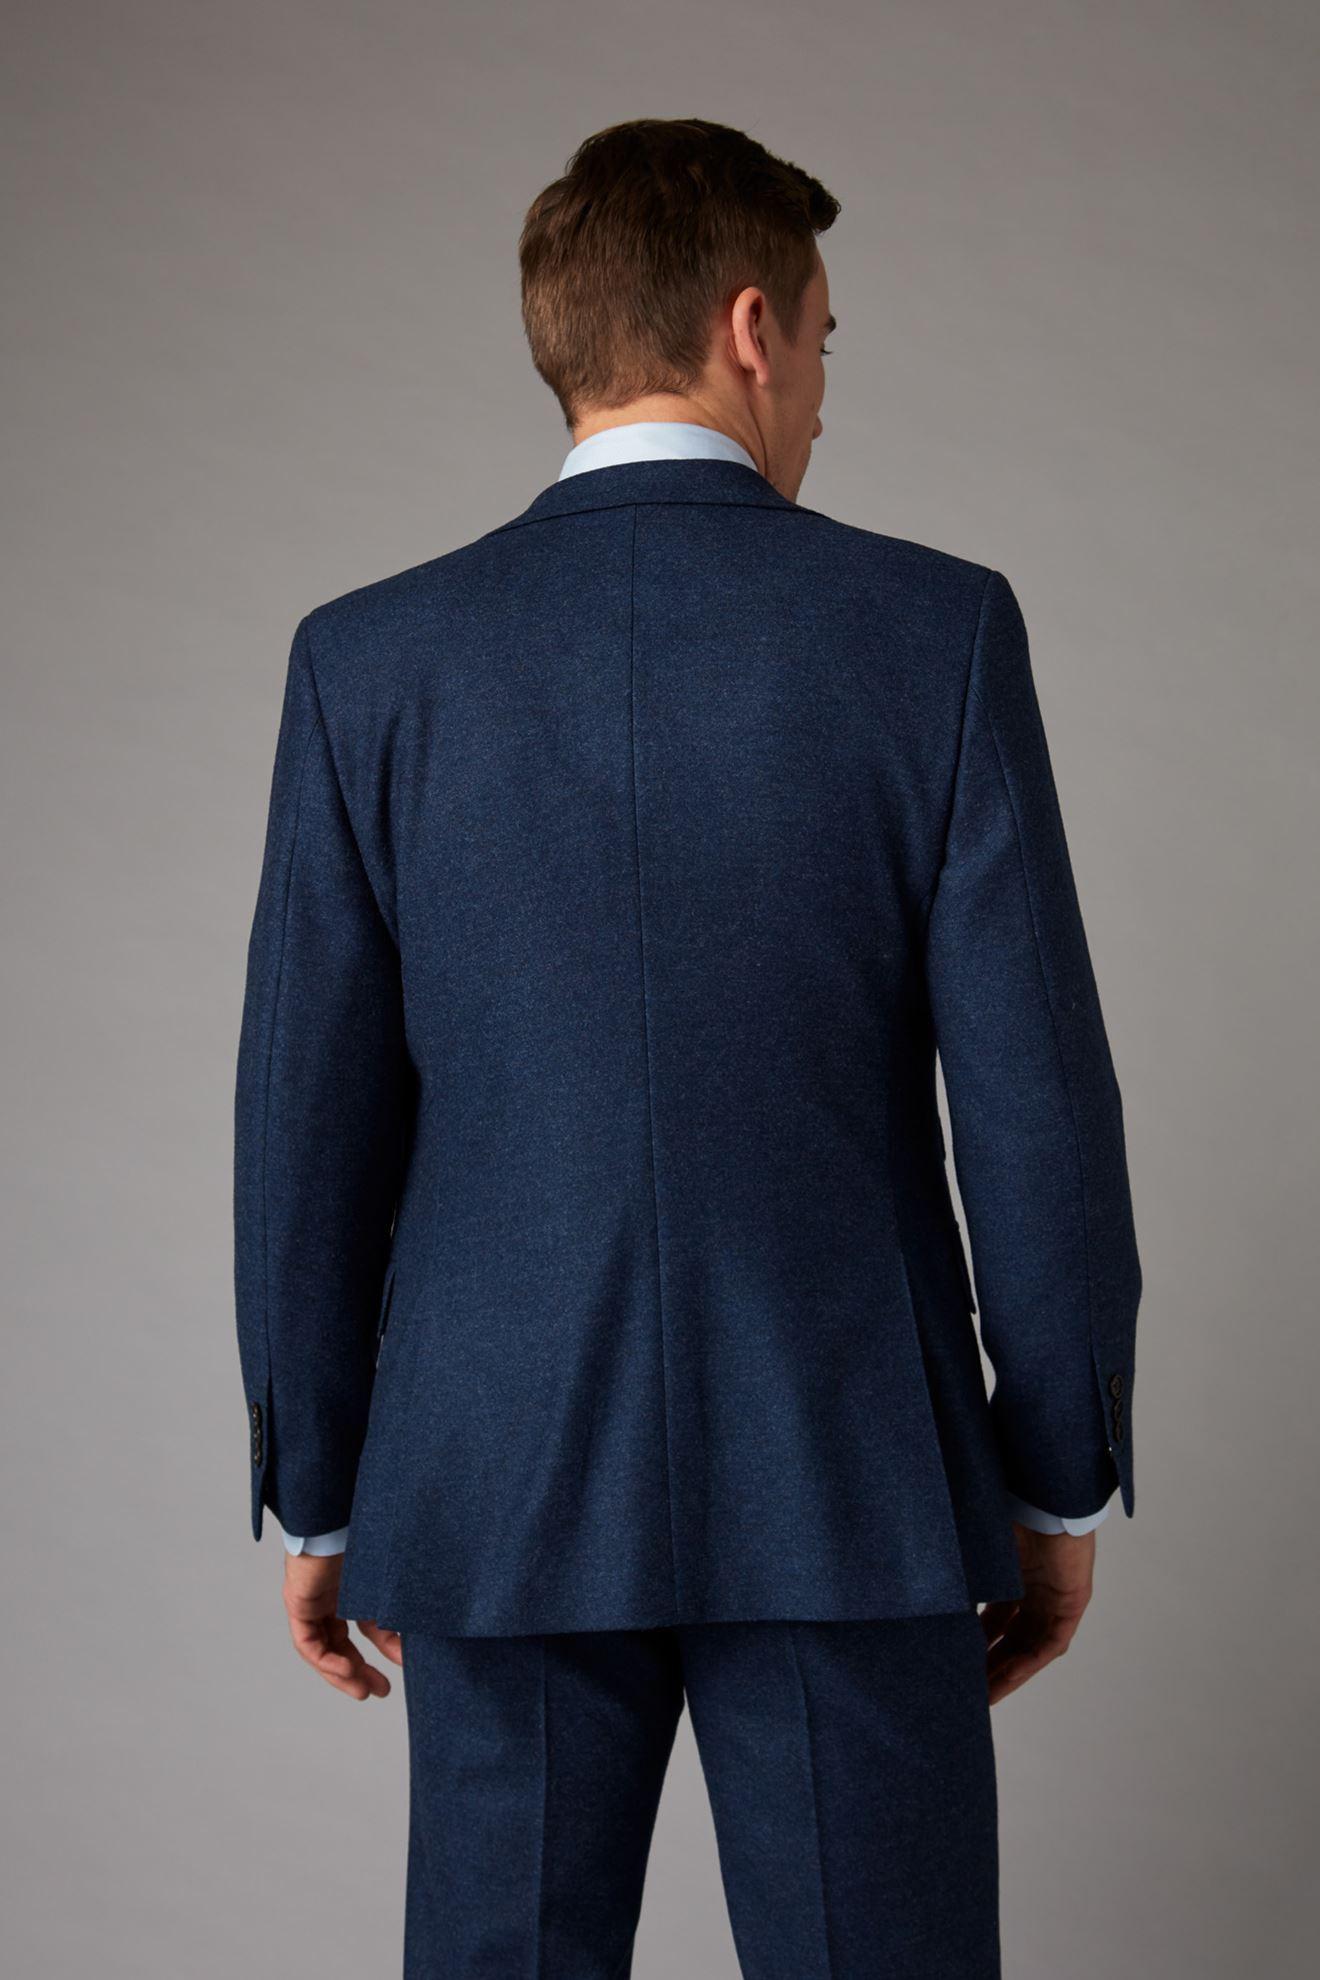 Blue Tweed Jacket Back